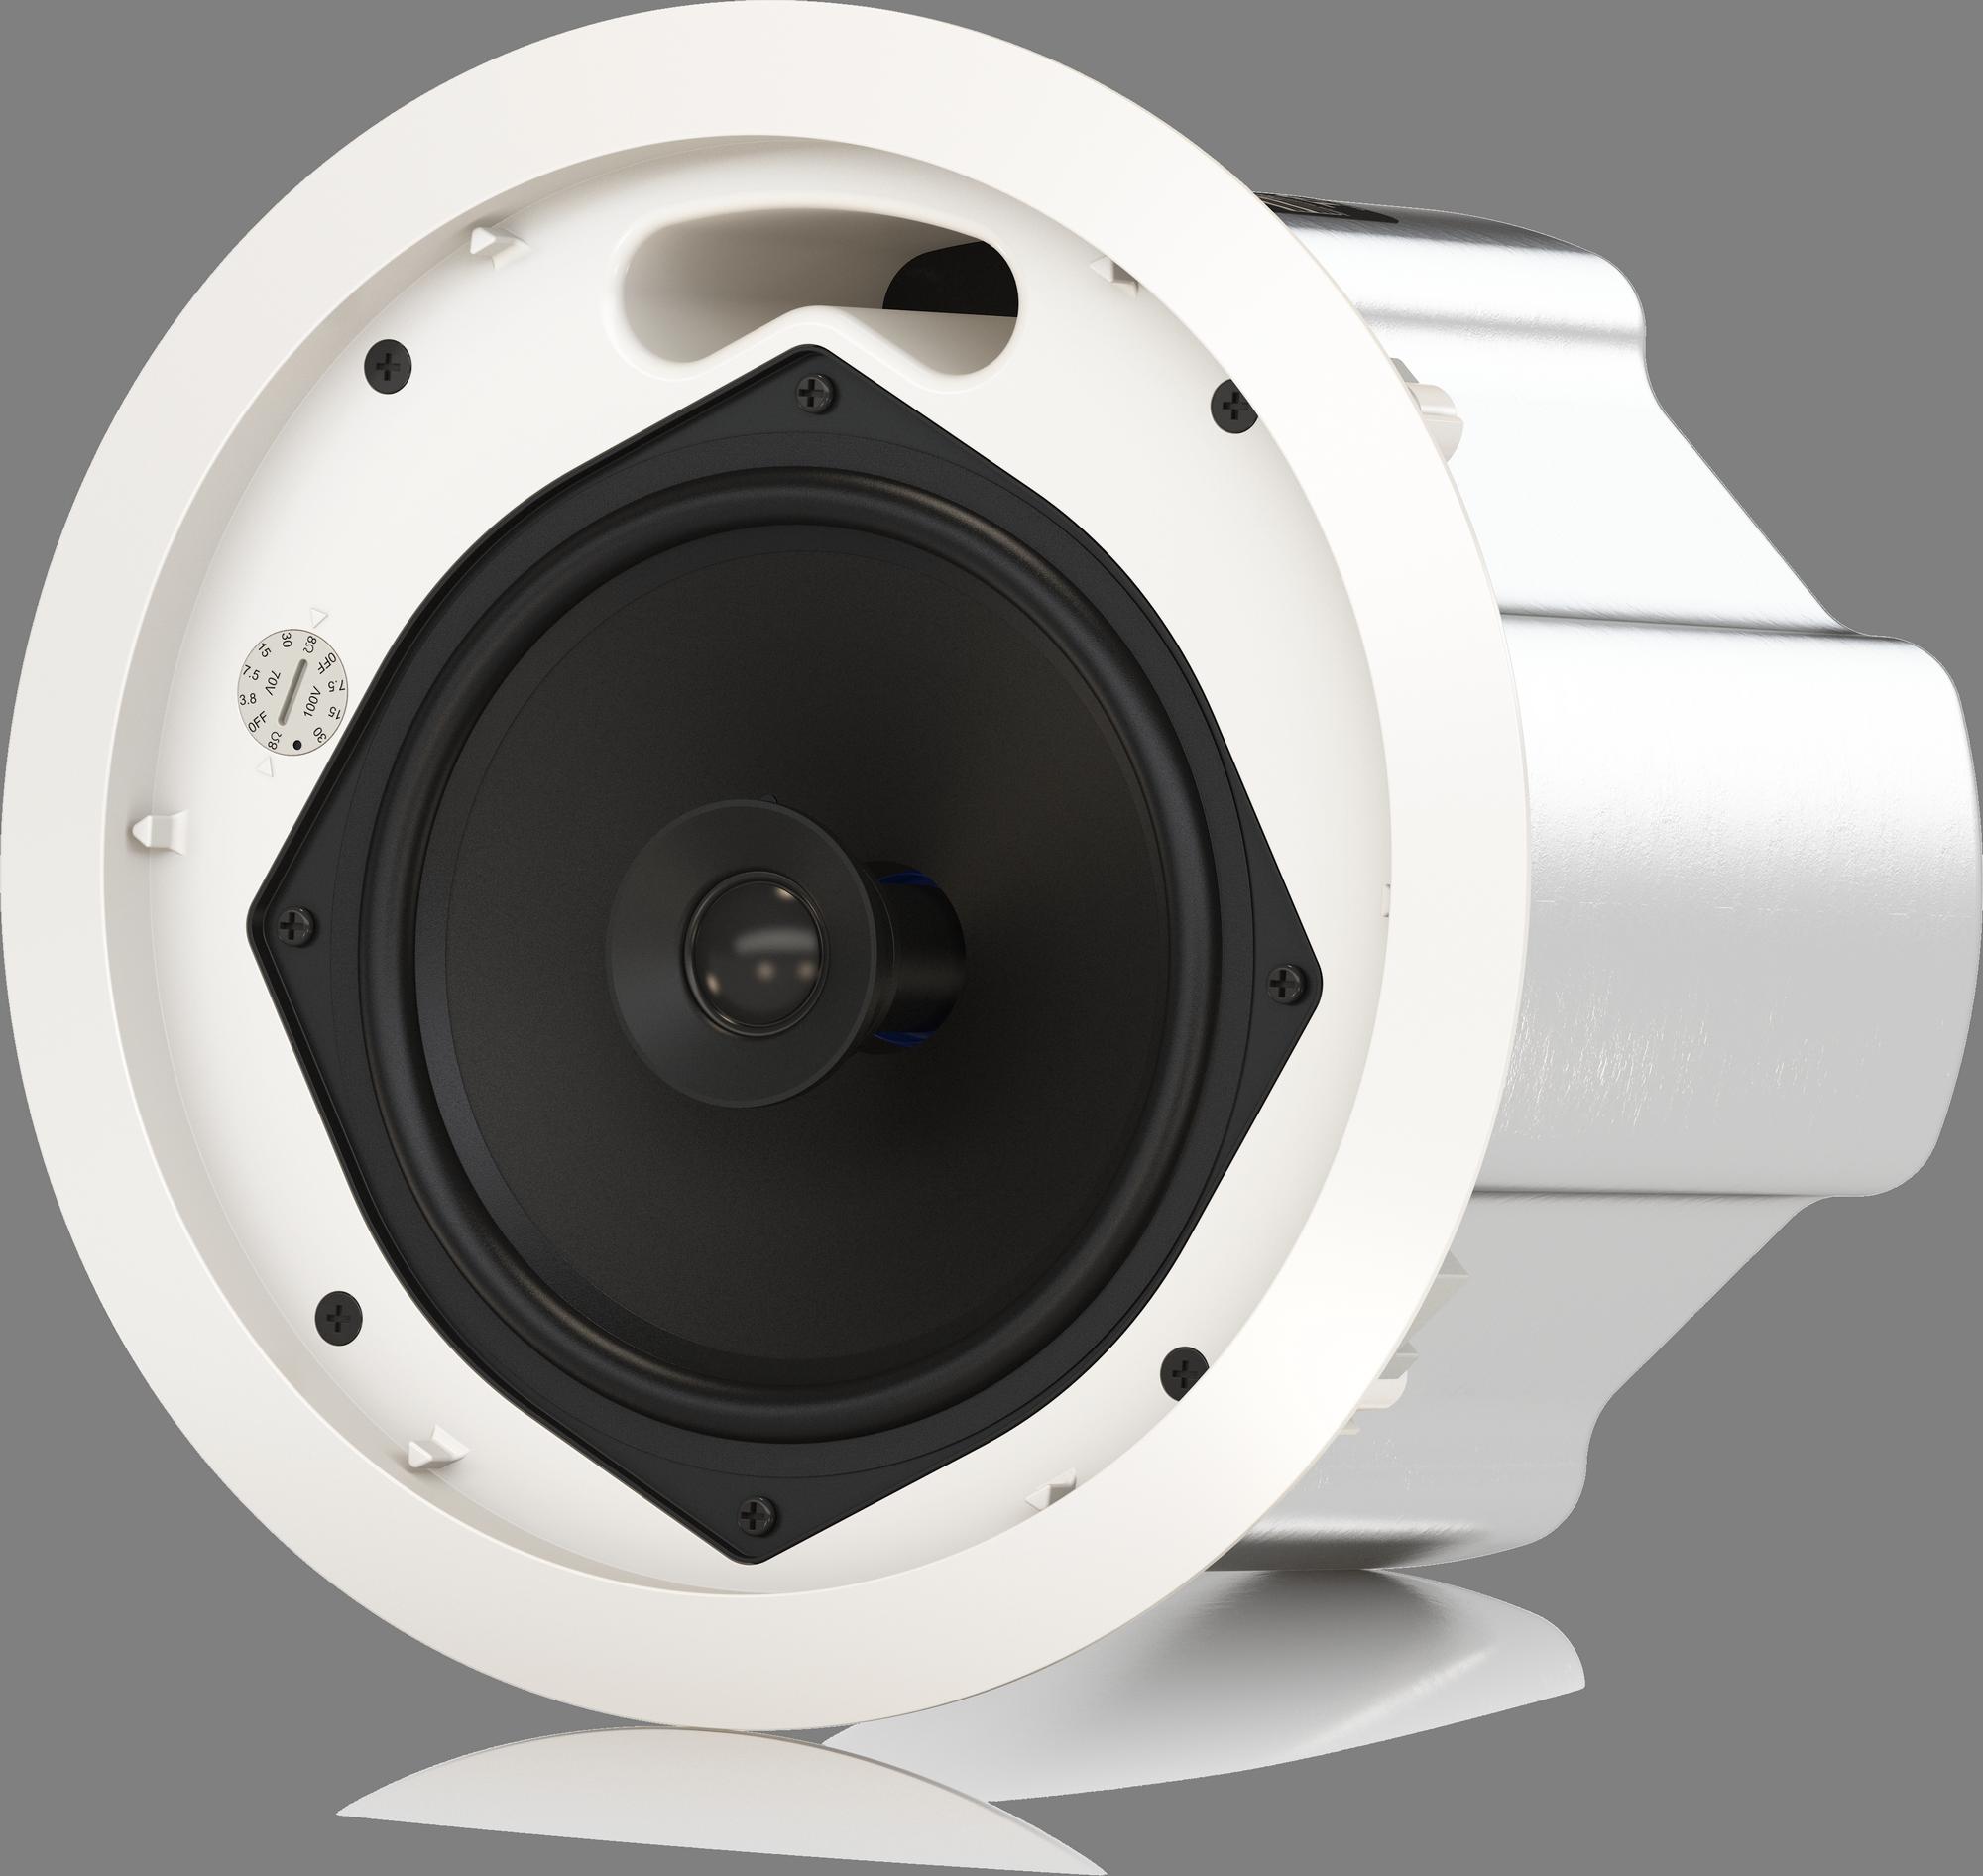 Tannoy  CVS 601 - Haut parleur d'installation